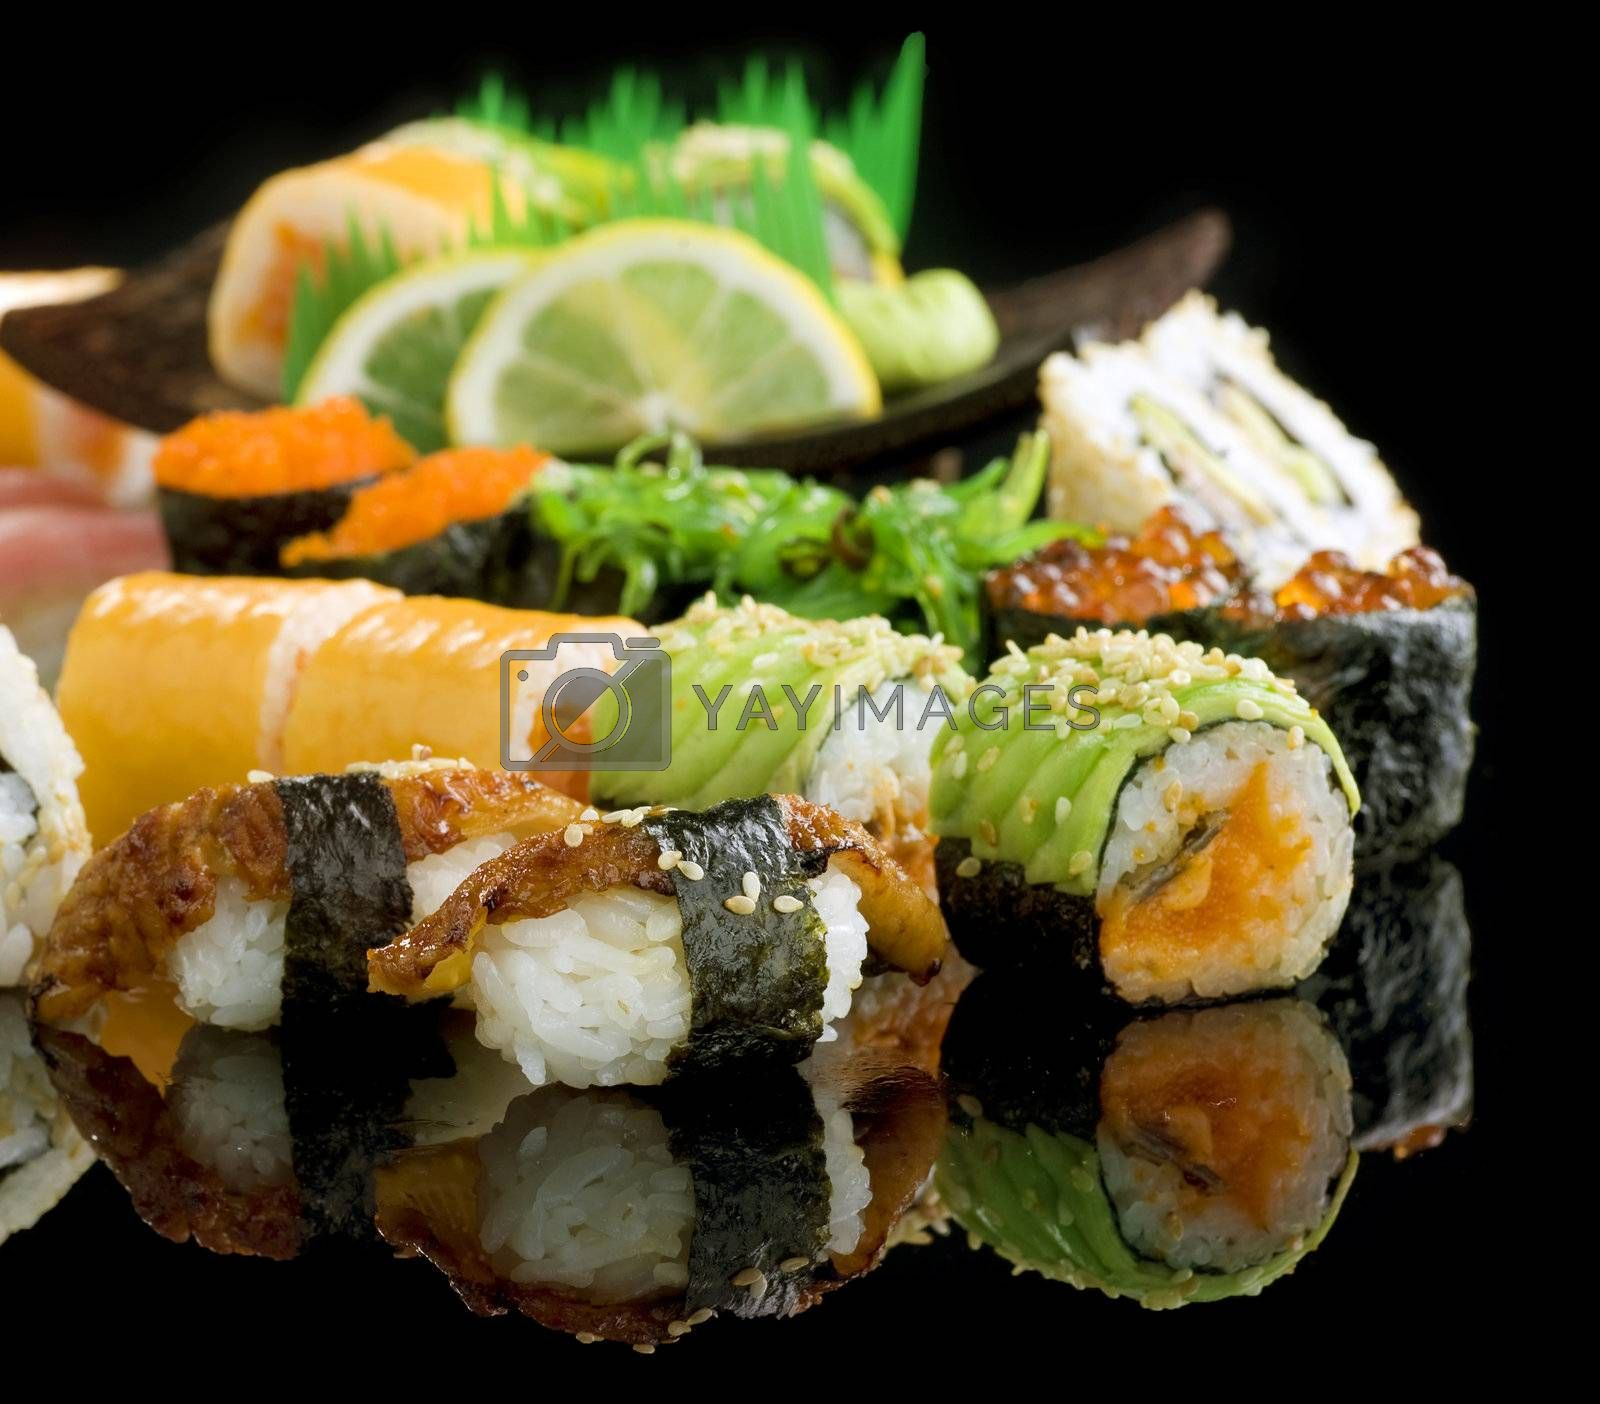 Sushi set by Subbotina Anna